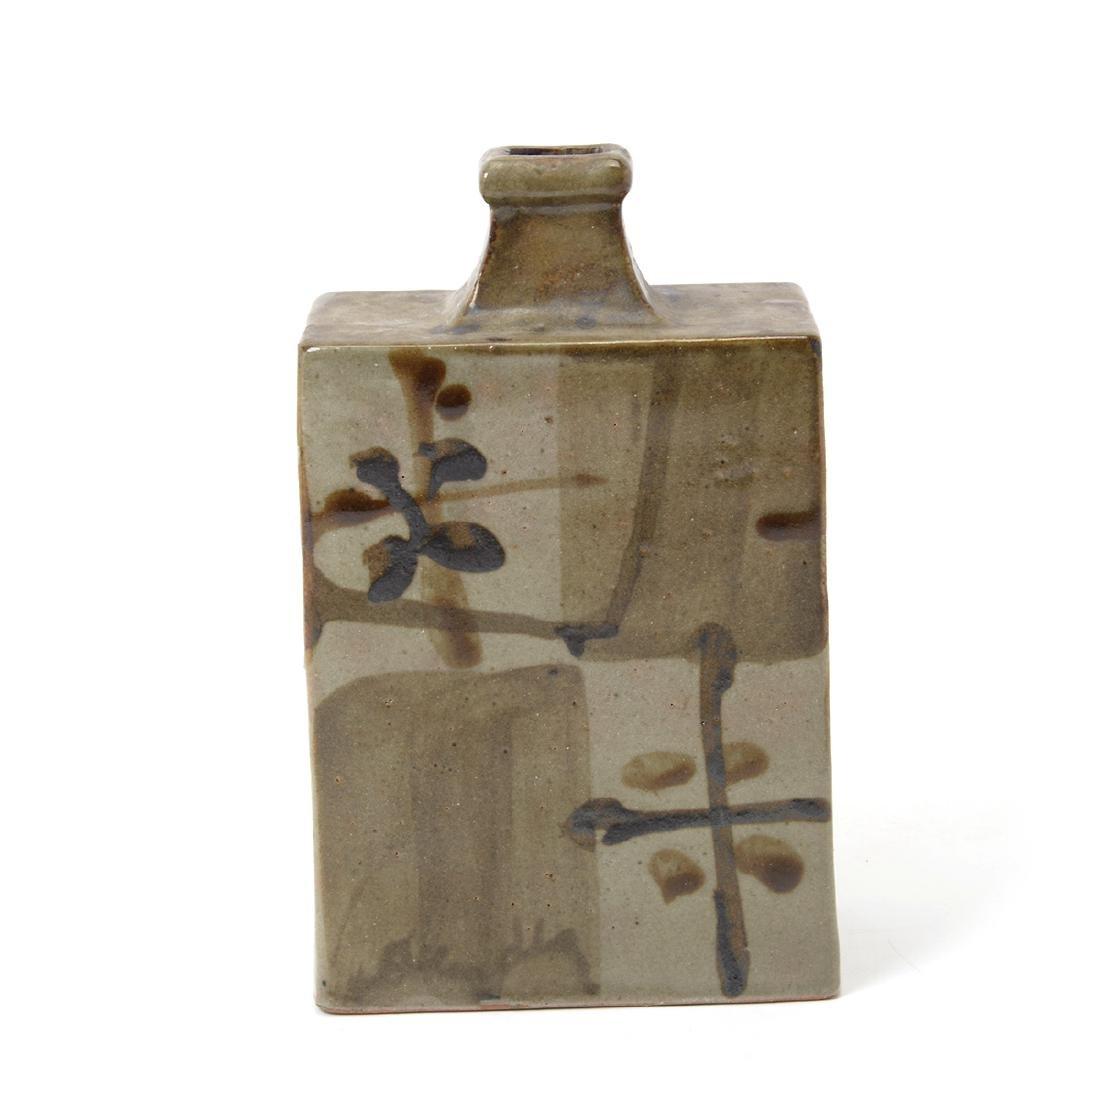 Japanese Glazed Ceramic Square Bottle Vase - 2